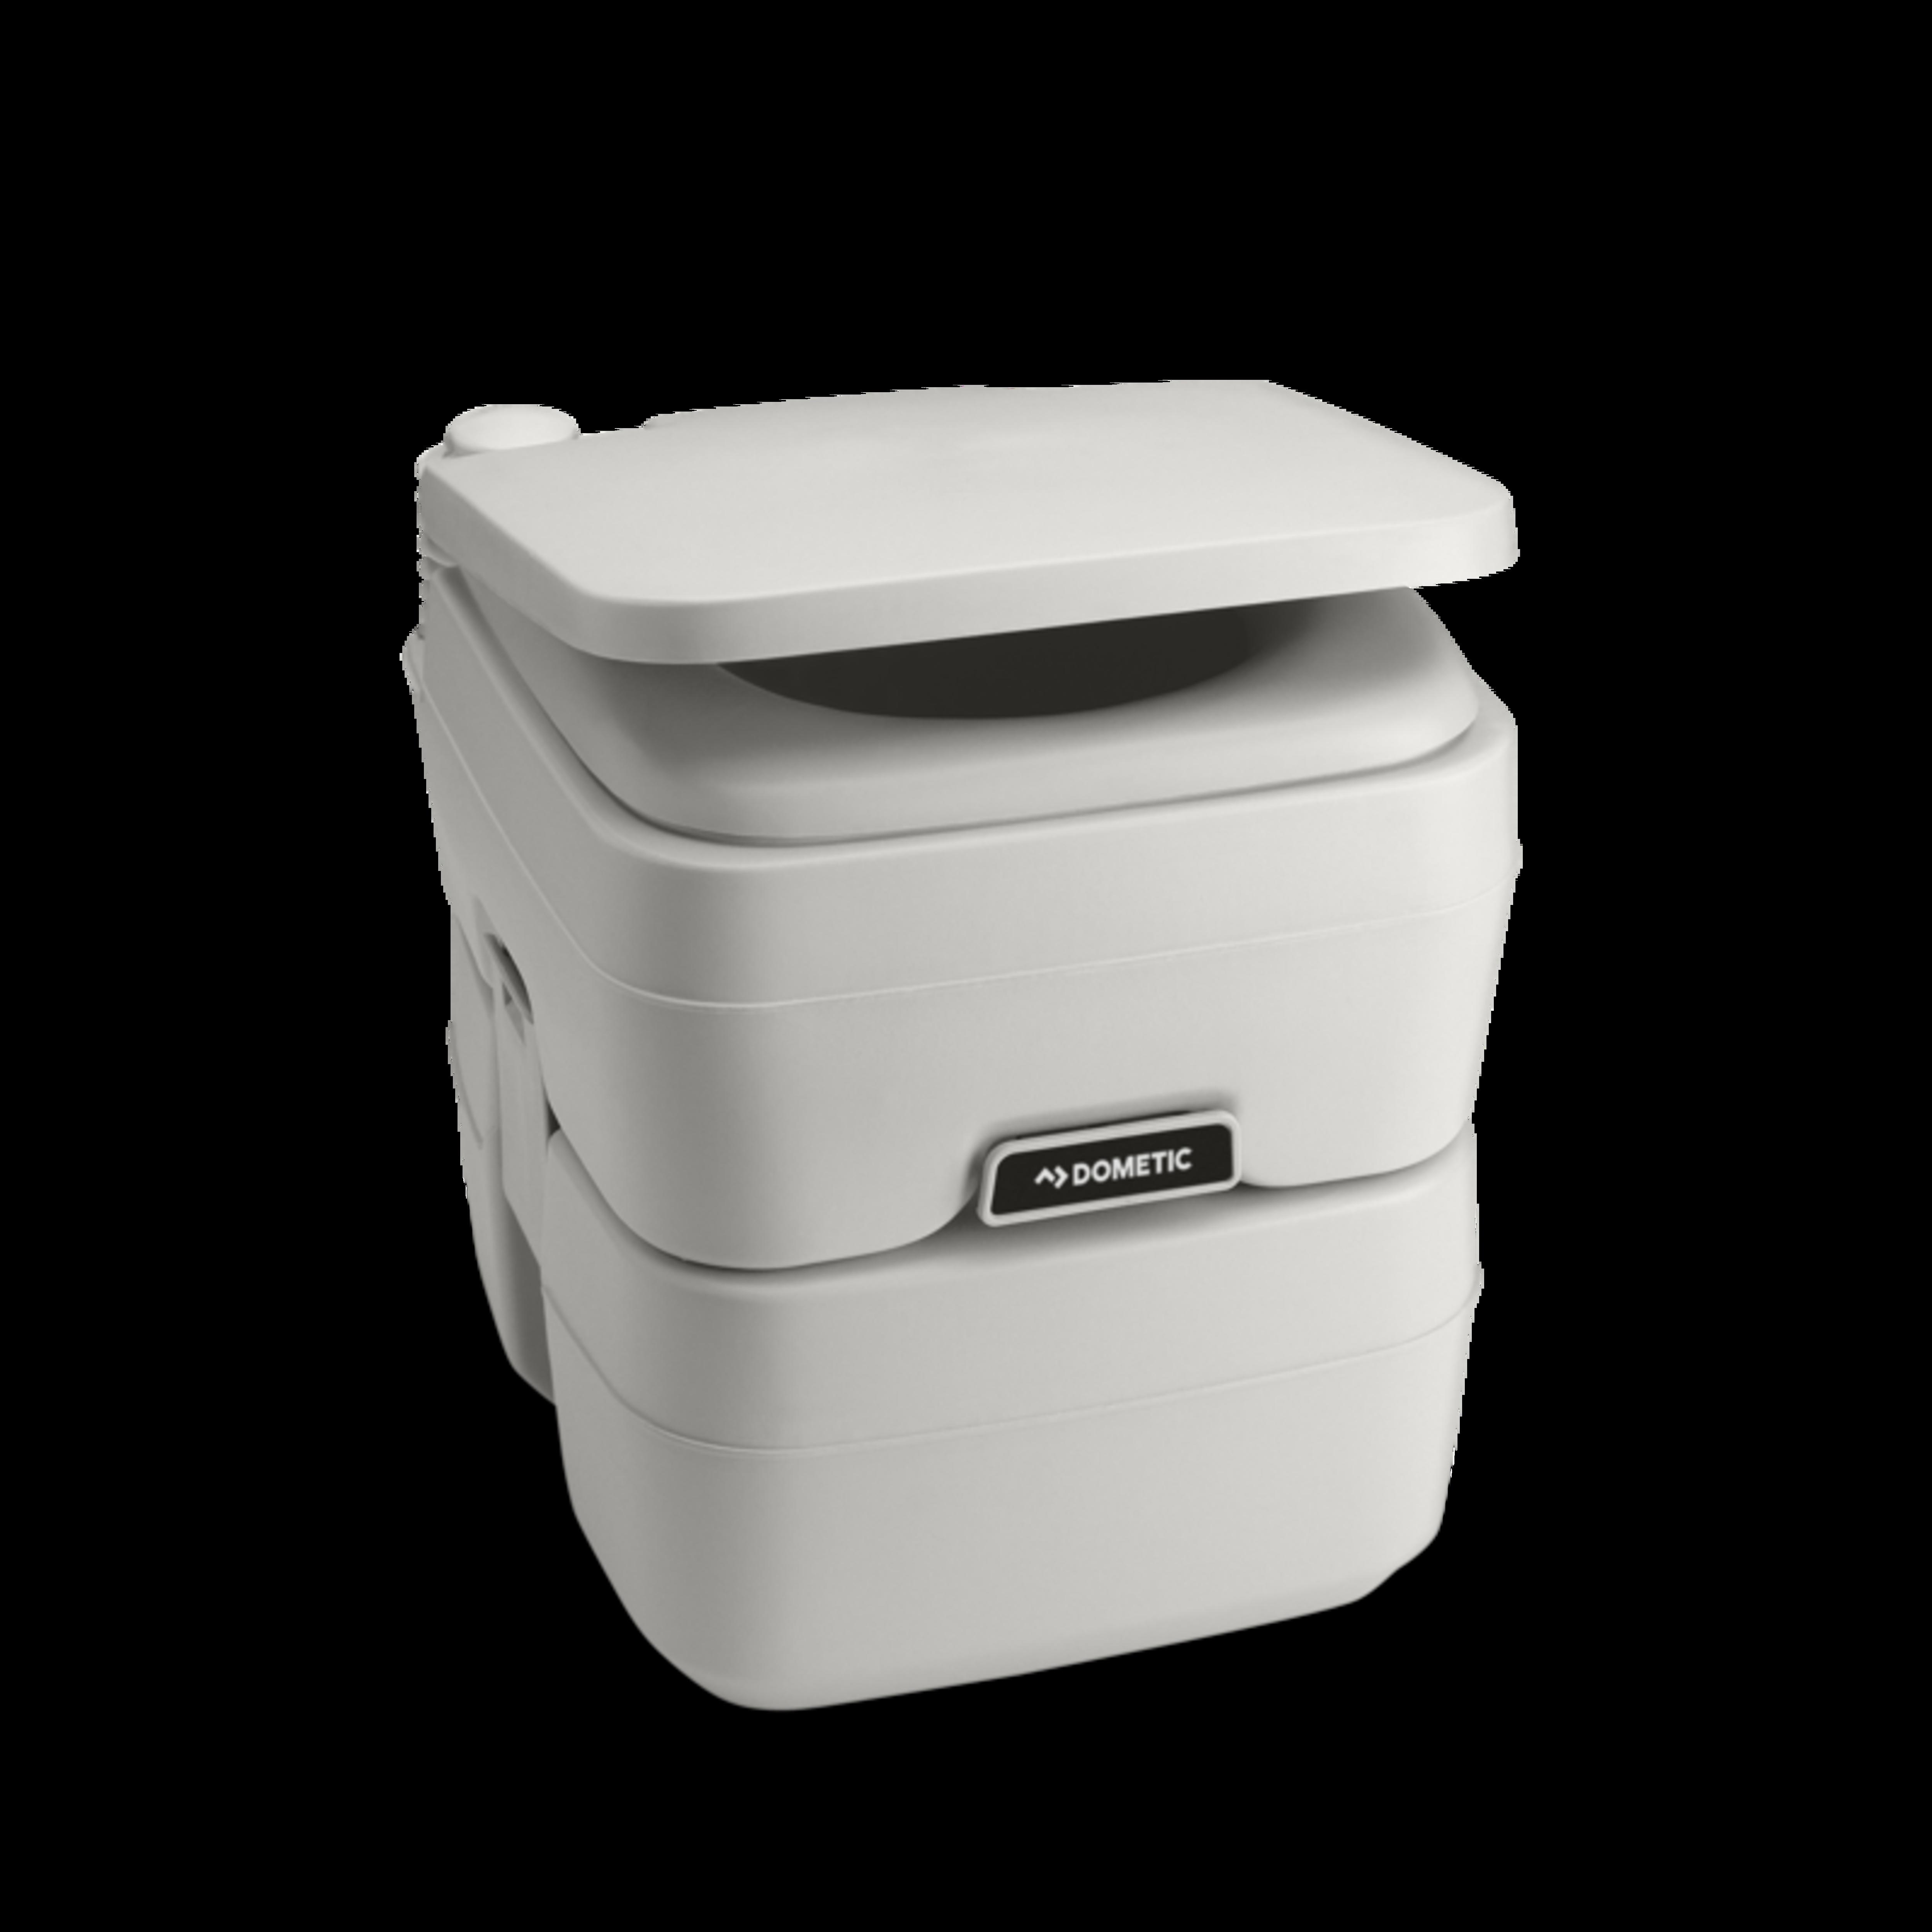 Dometic Potti Sanipottie 976 Portable Toilet 18.9l Caravan Camping Marine Parts & Accessories